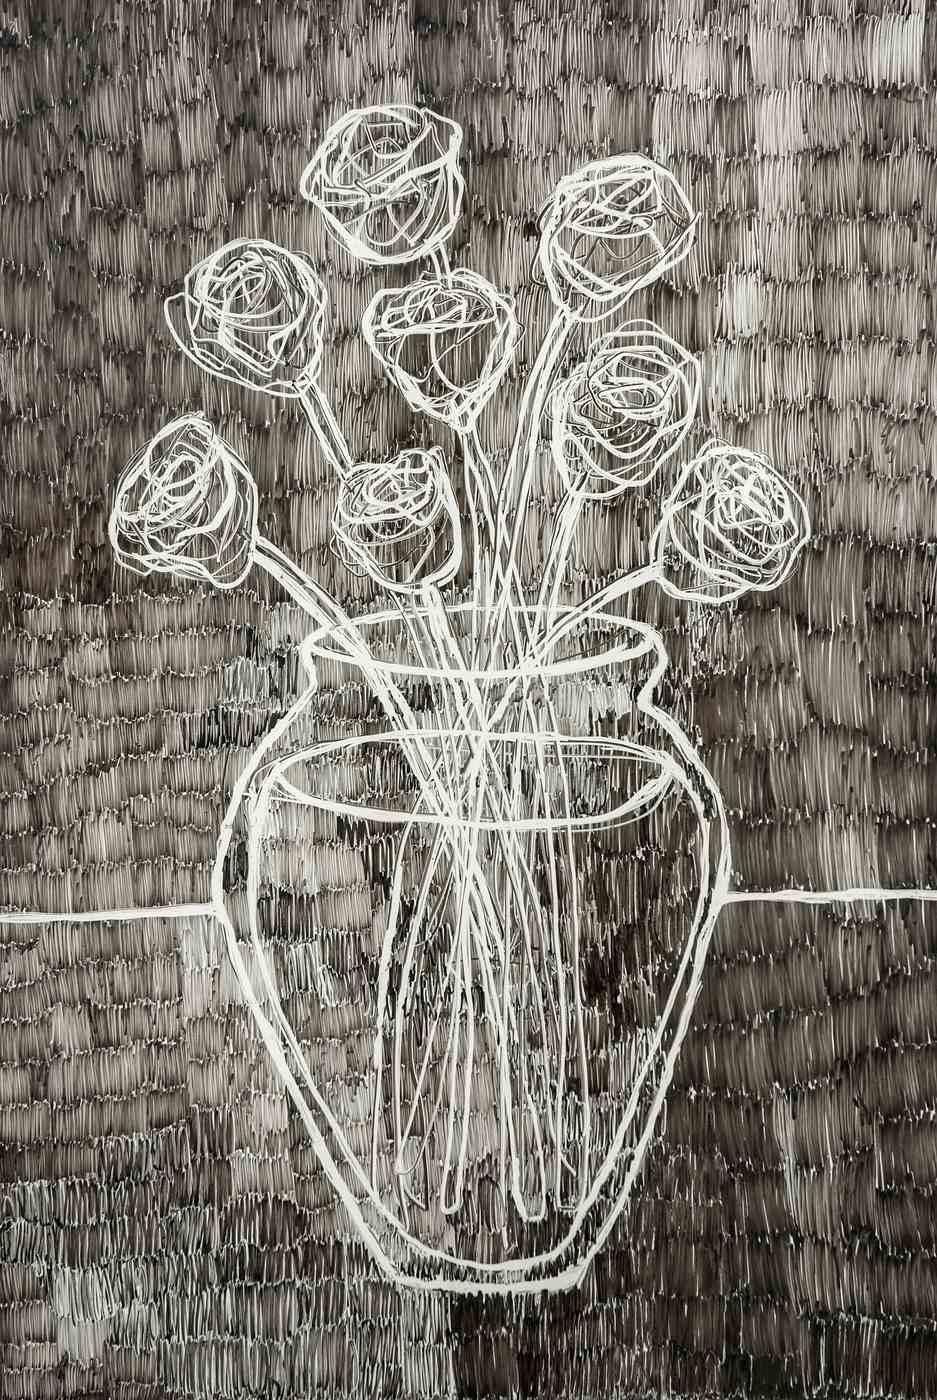 20.FlowersInAVase-Detail